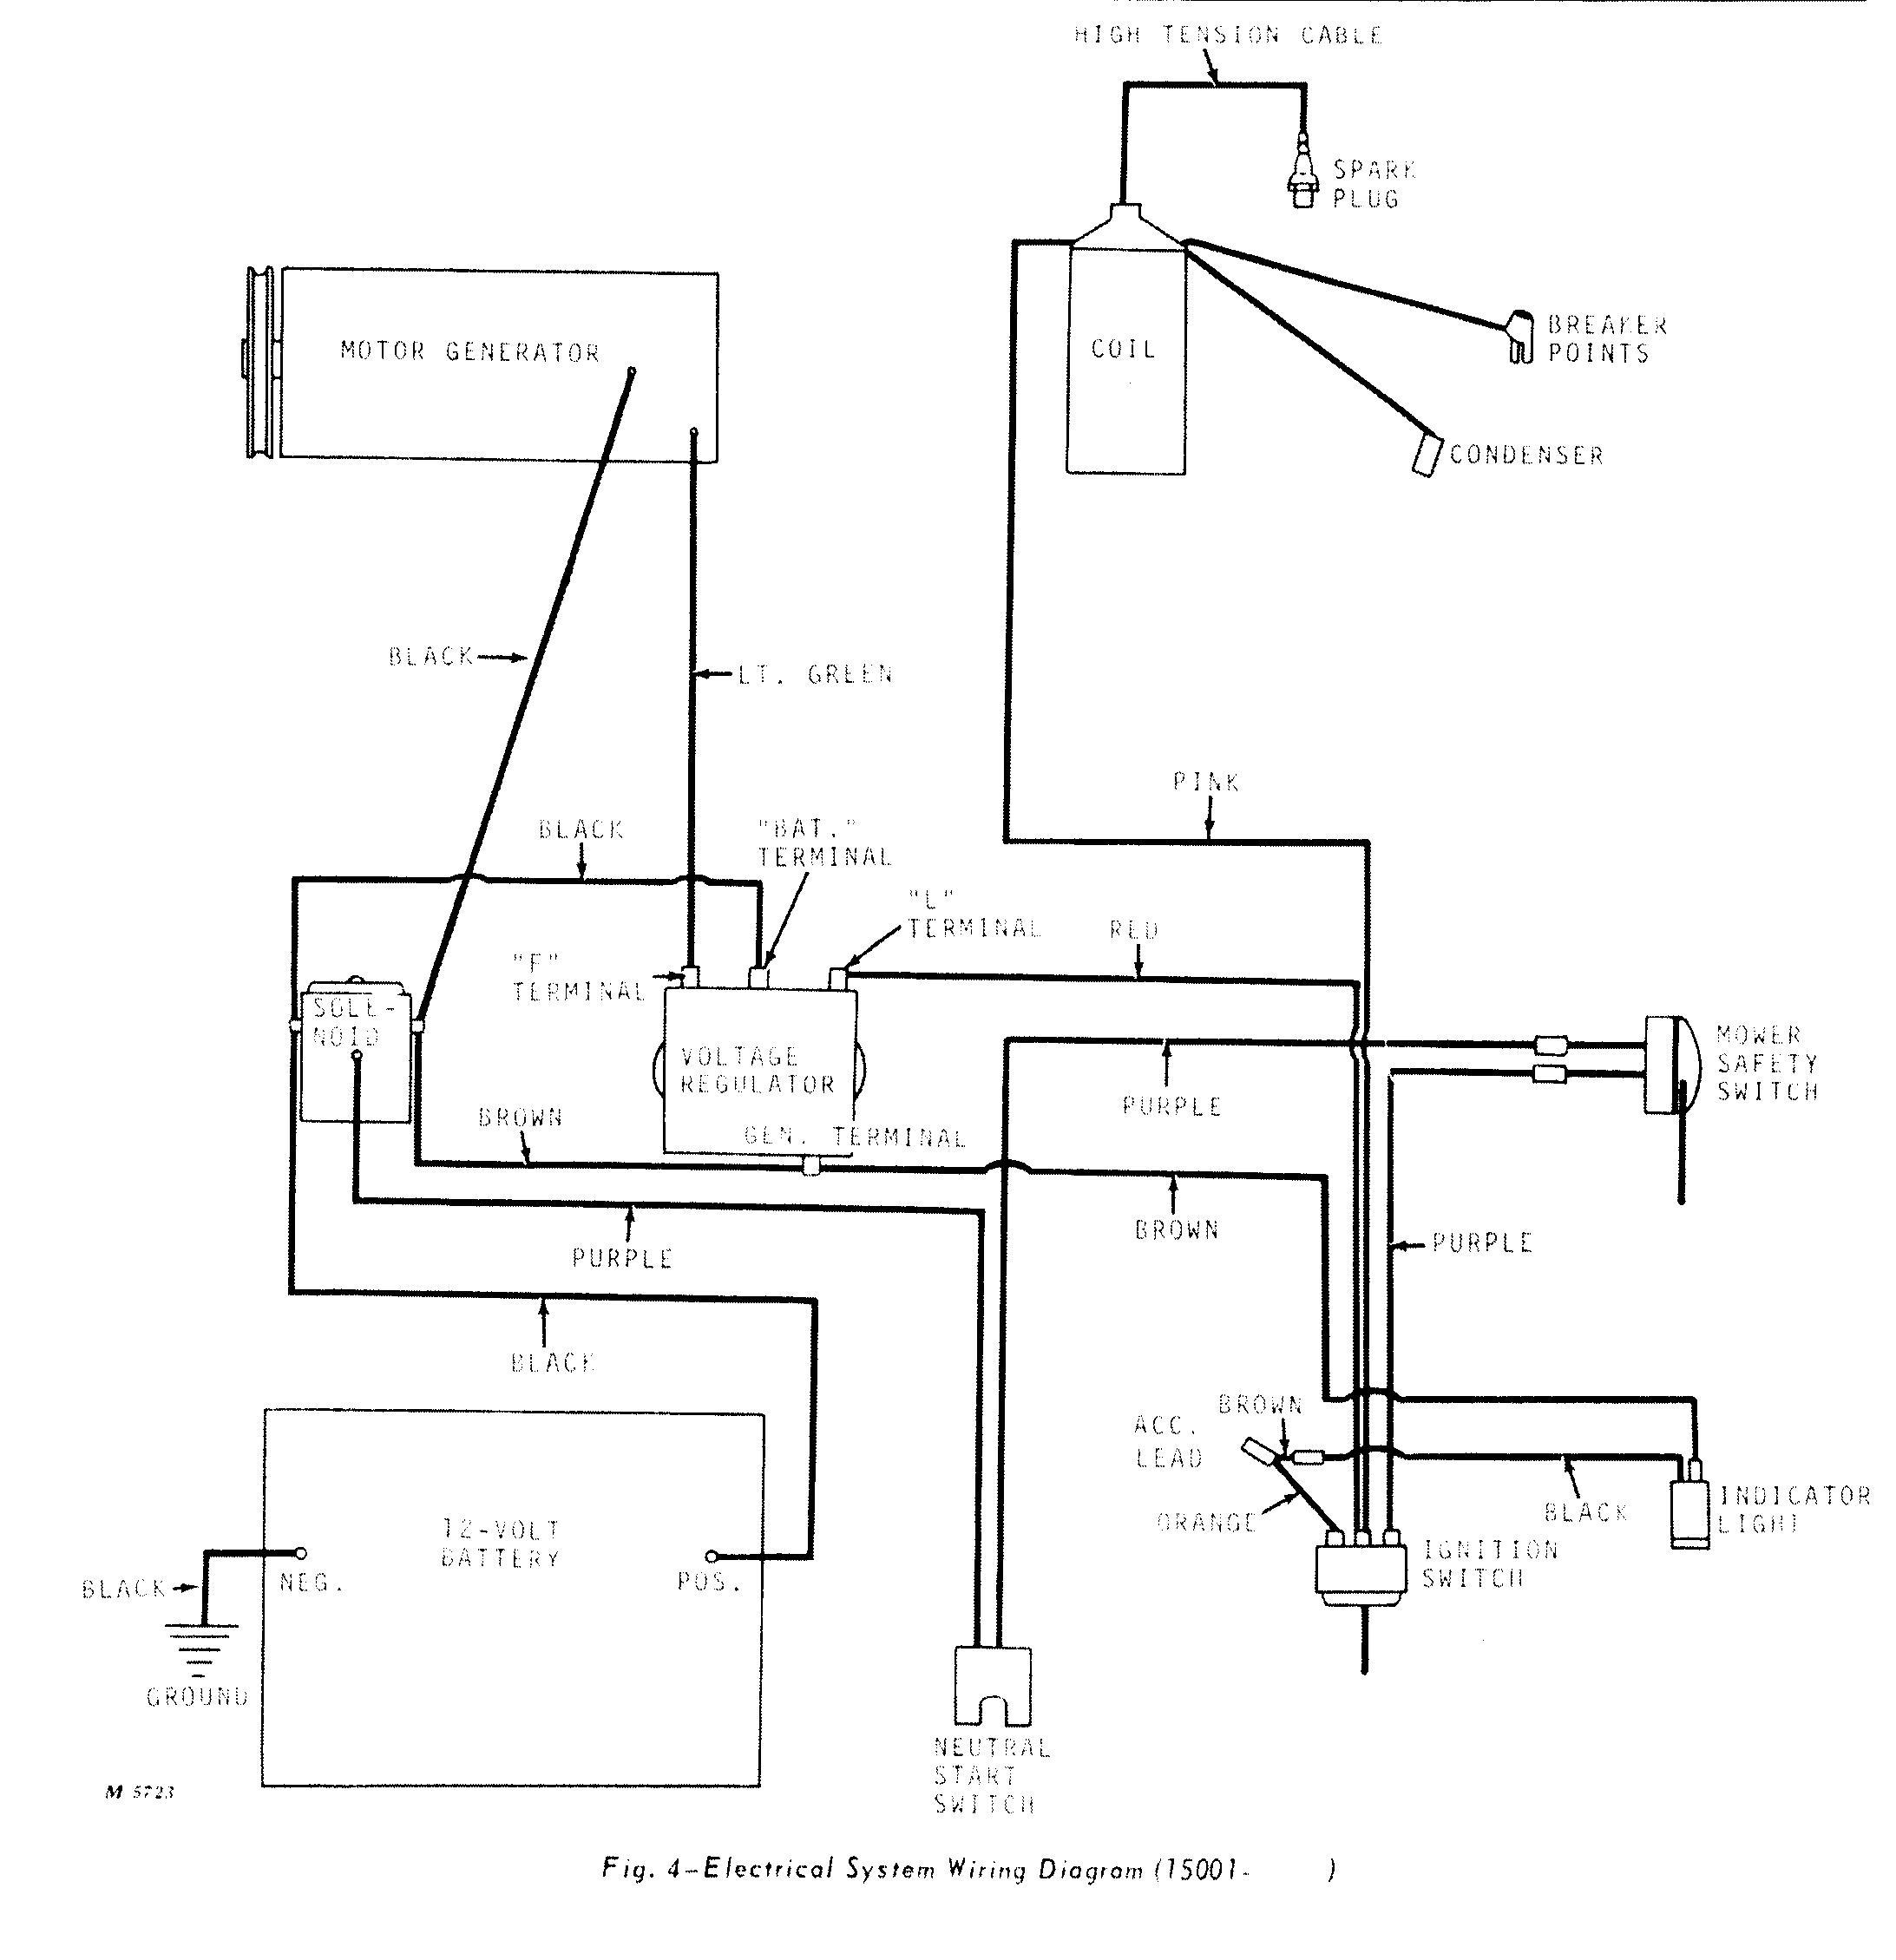 [DIAGRAM_38IS]  NG_6008] John Deere 110 1967 Wiring Harness Download Diagram | Deere 110 Headlight Wiring Diagram |  | Ical Menia Hison Rine Itis Gue45 Mohammedshrine Librar Wiring 101